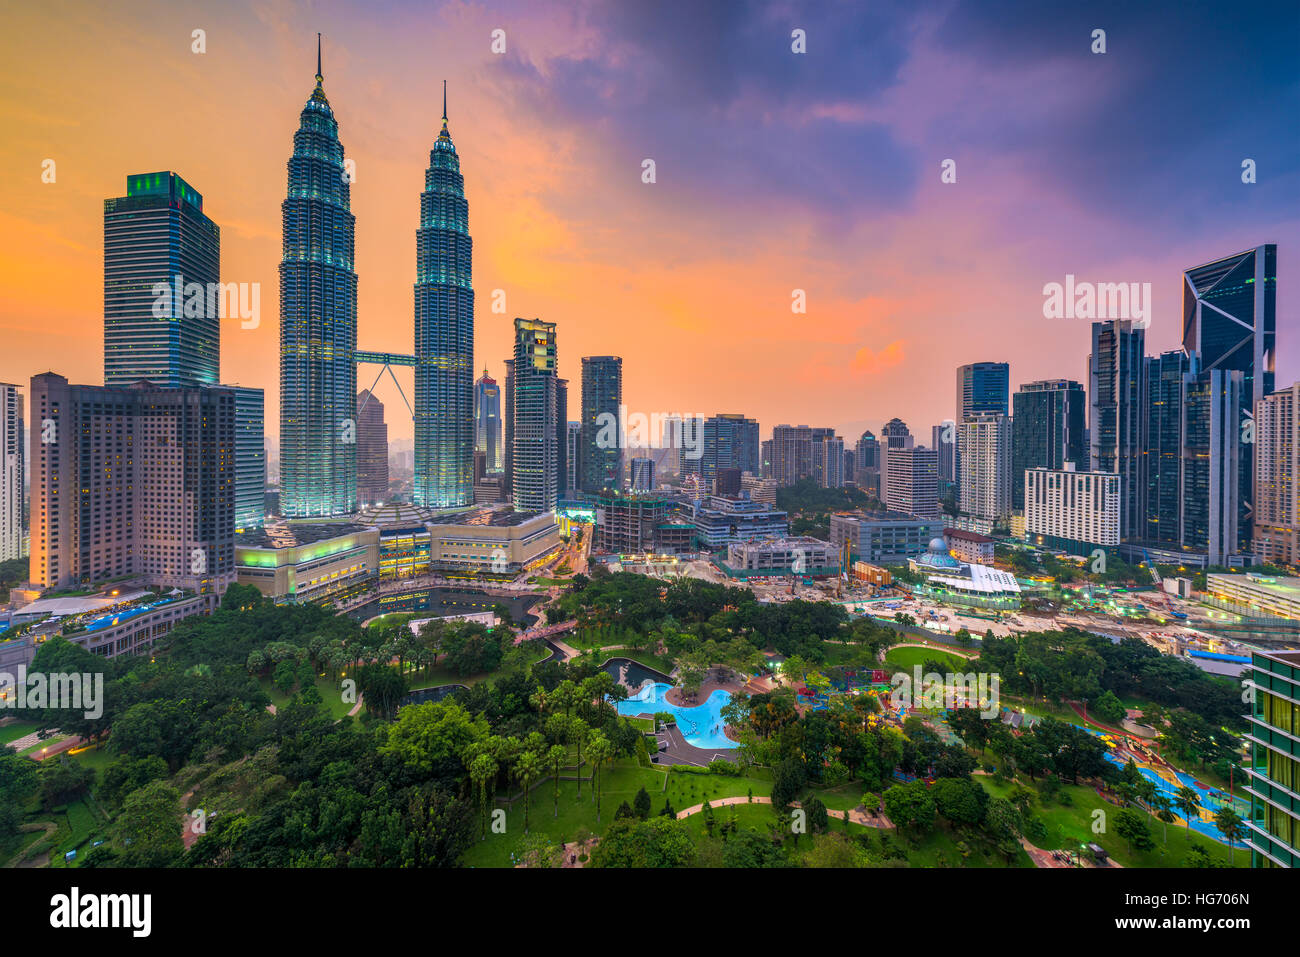 Kuala Lumpur, Malaysia skyline at dusk over the park. - Stock Image